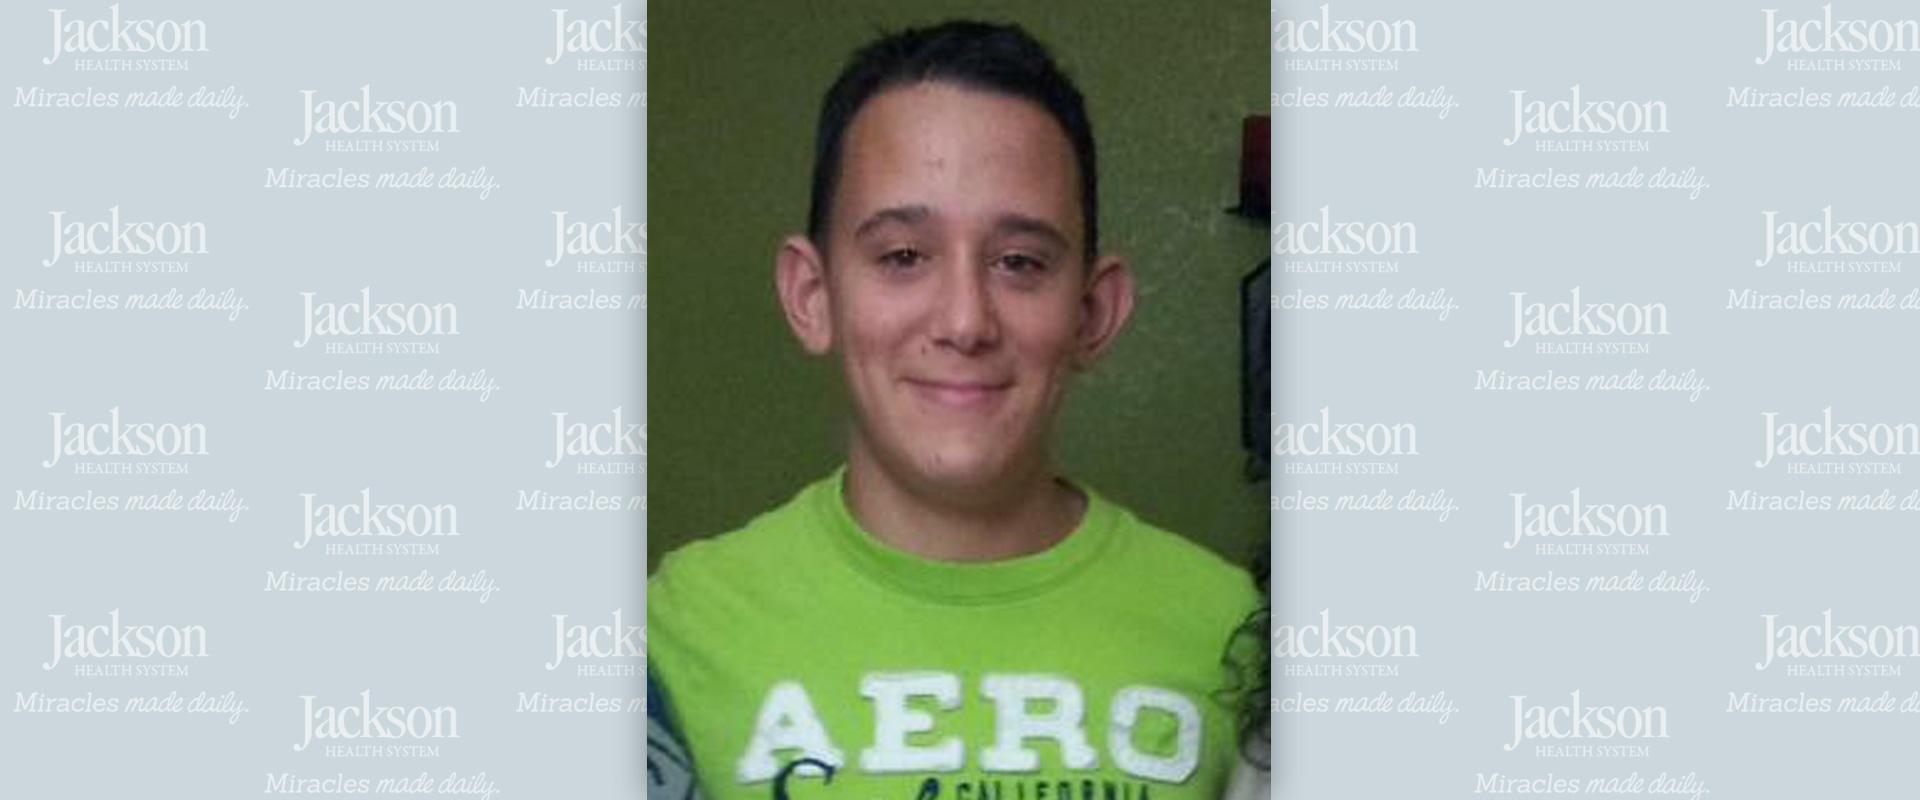 Yasser Lopez, teenage Jackson patient that was saved